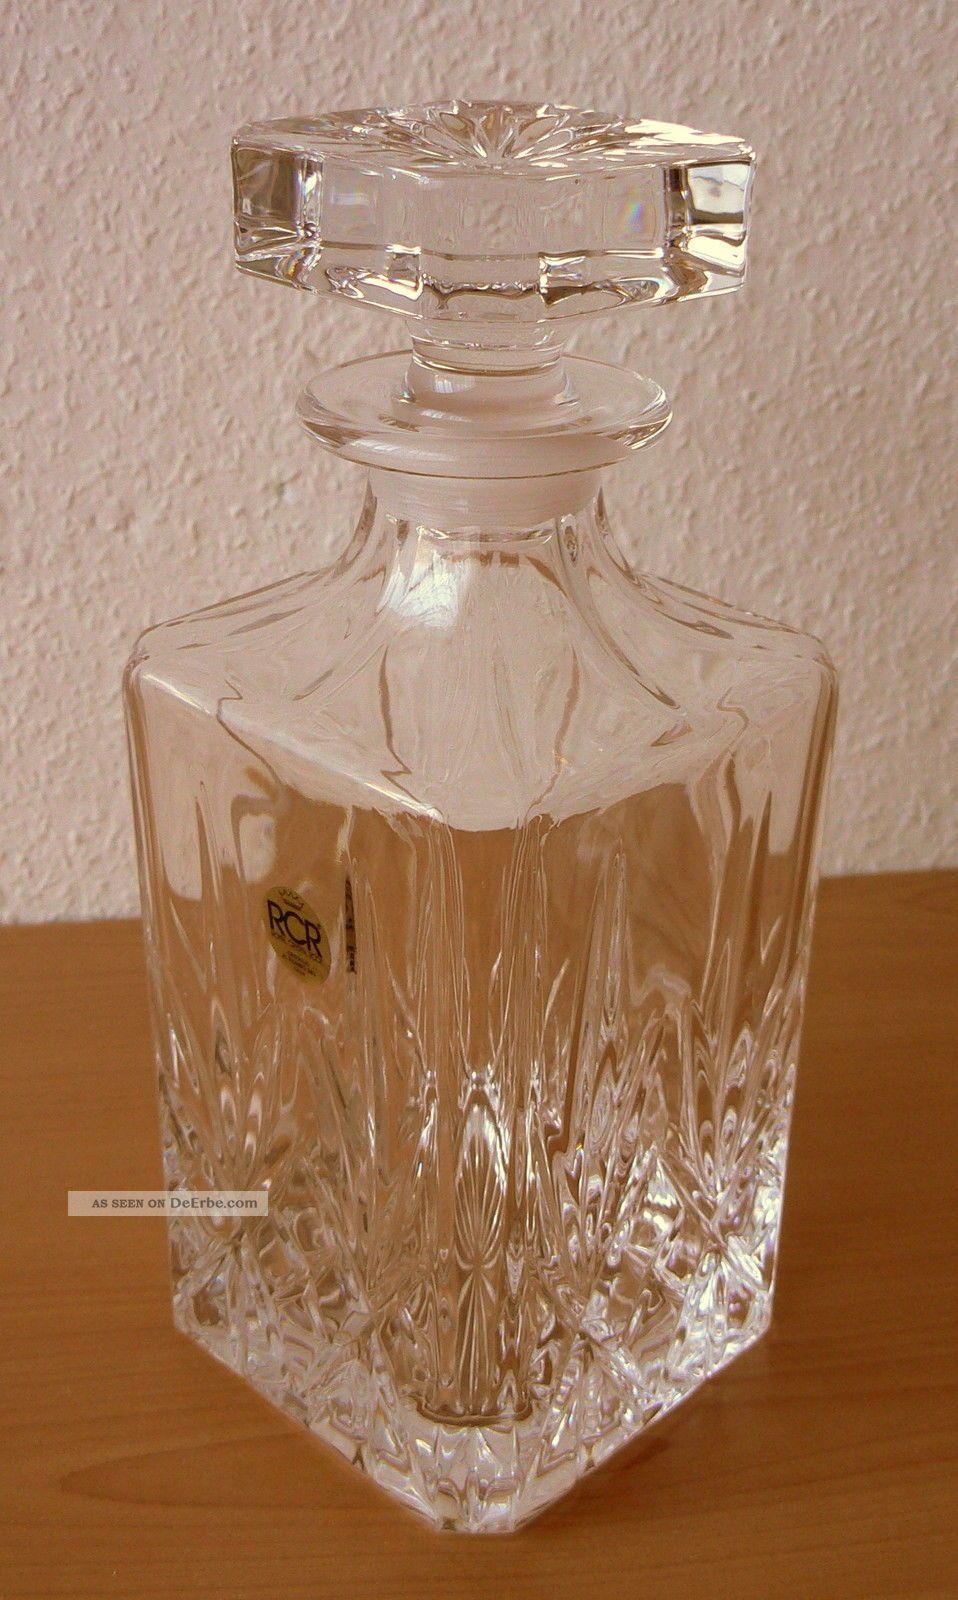 whisky karaffe rcr bleikristall made in italy ca 0 7 liter neuwertig. Black Bedroom Furniture Sets. Home Design Ideas